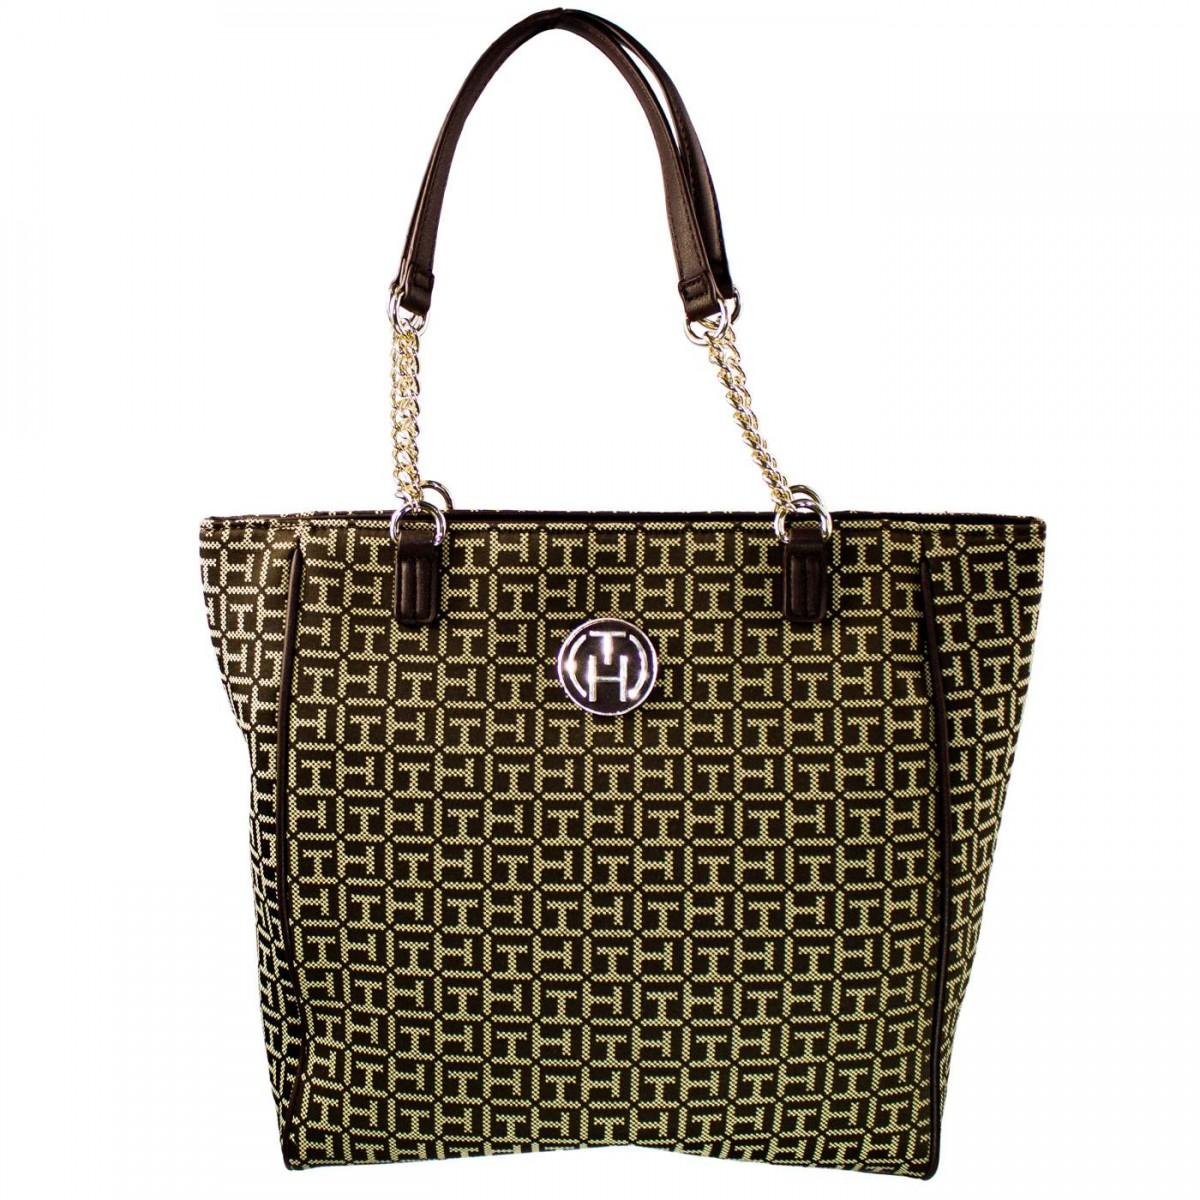 d17911abd Bizz Store - Bolsa Feminina Tommy Hilfiger Jacquard Shopper